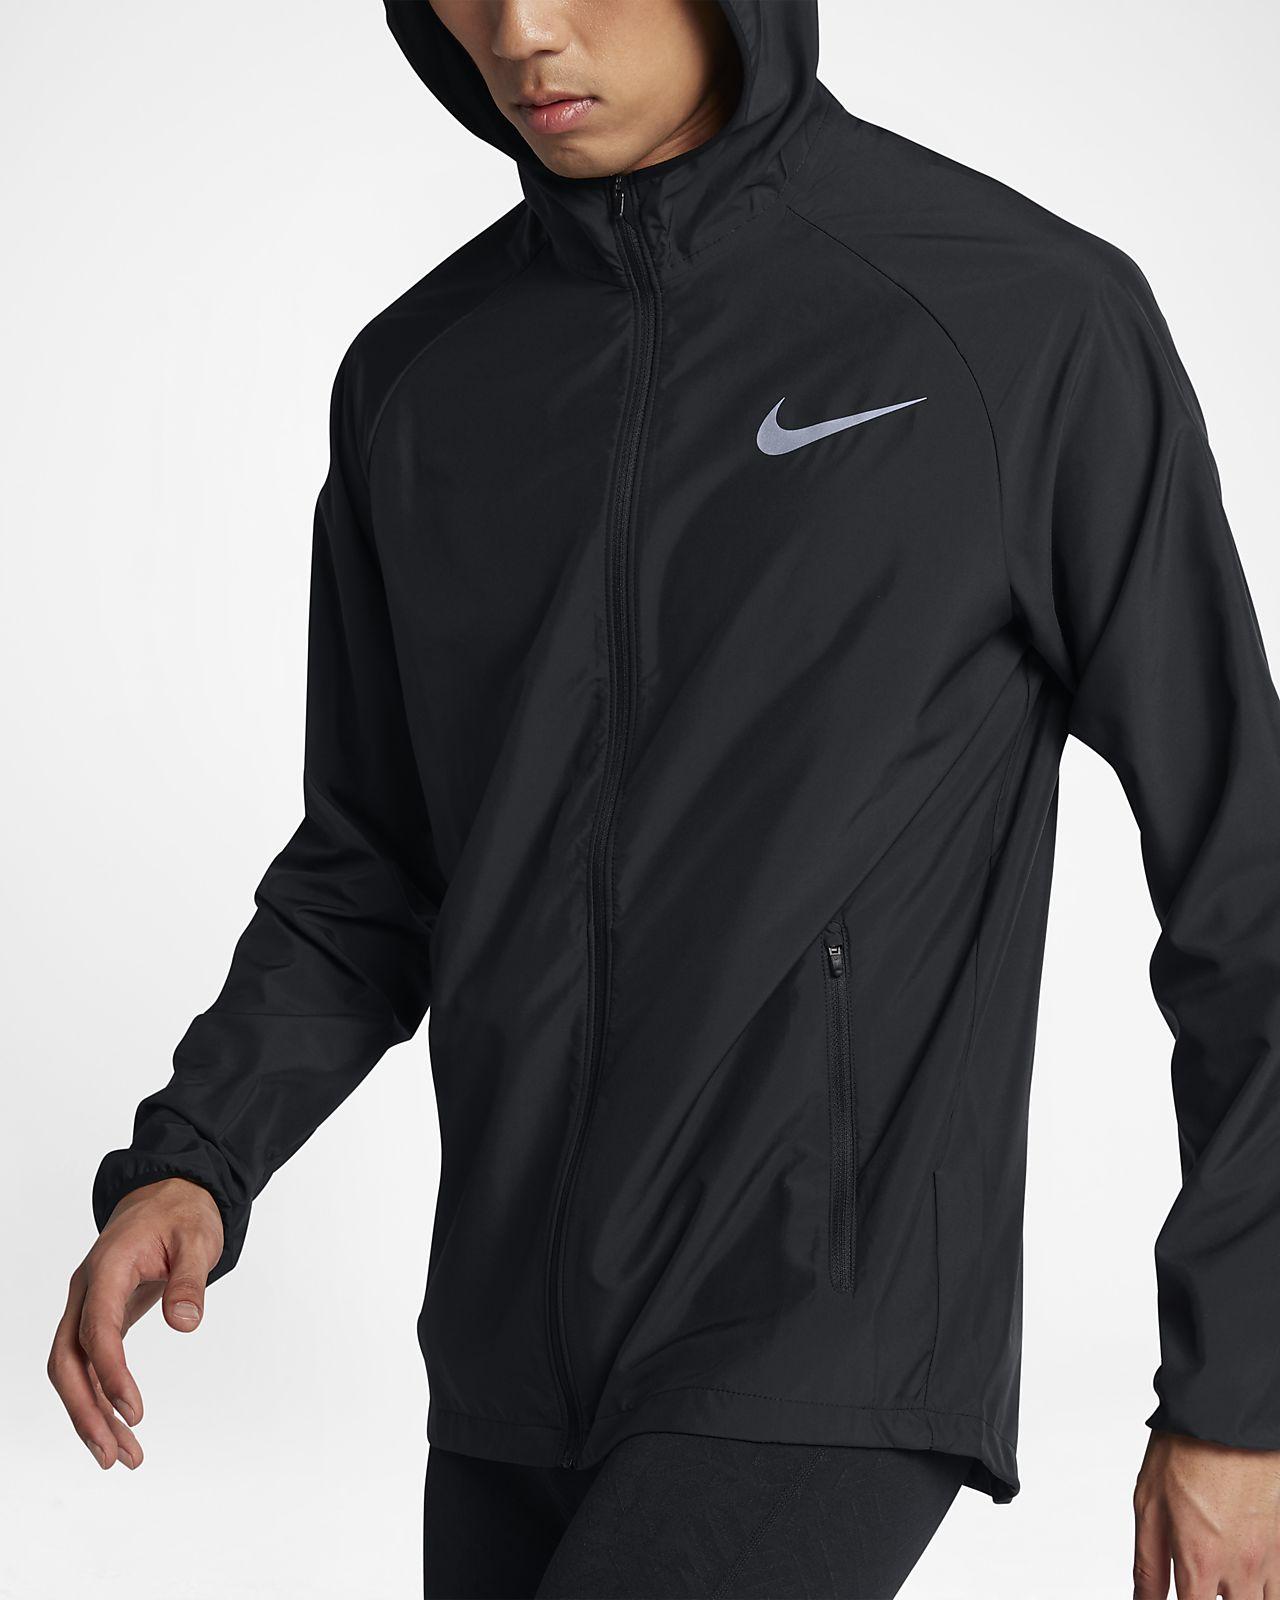 d480afd5 Мужская беговая куртка Nike Essential. Nike.com RU